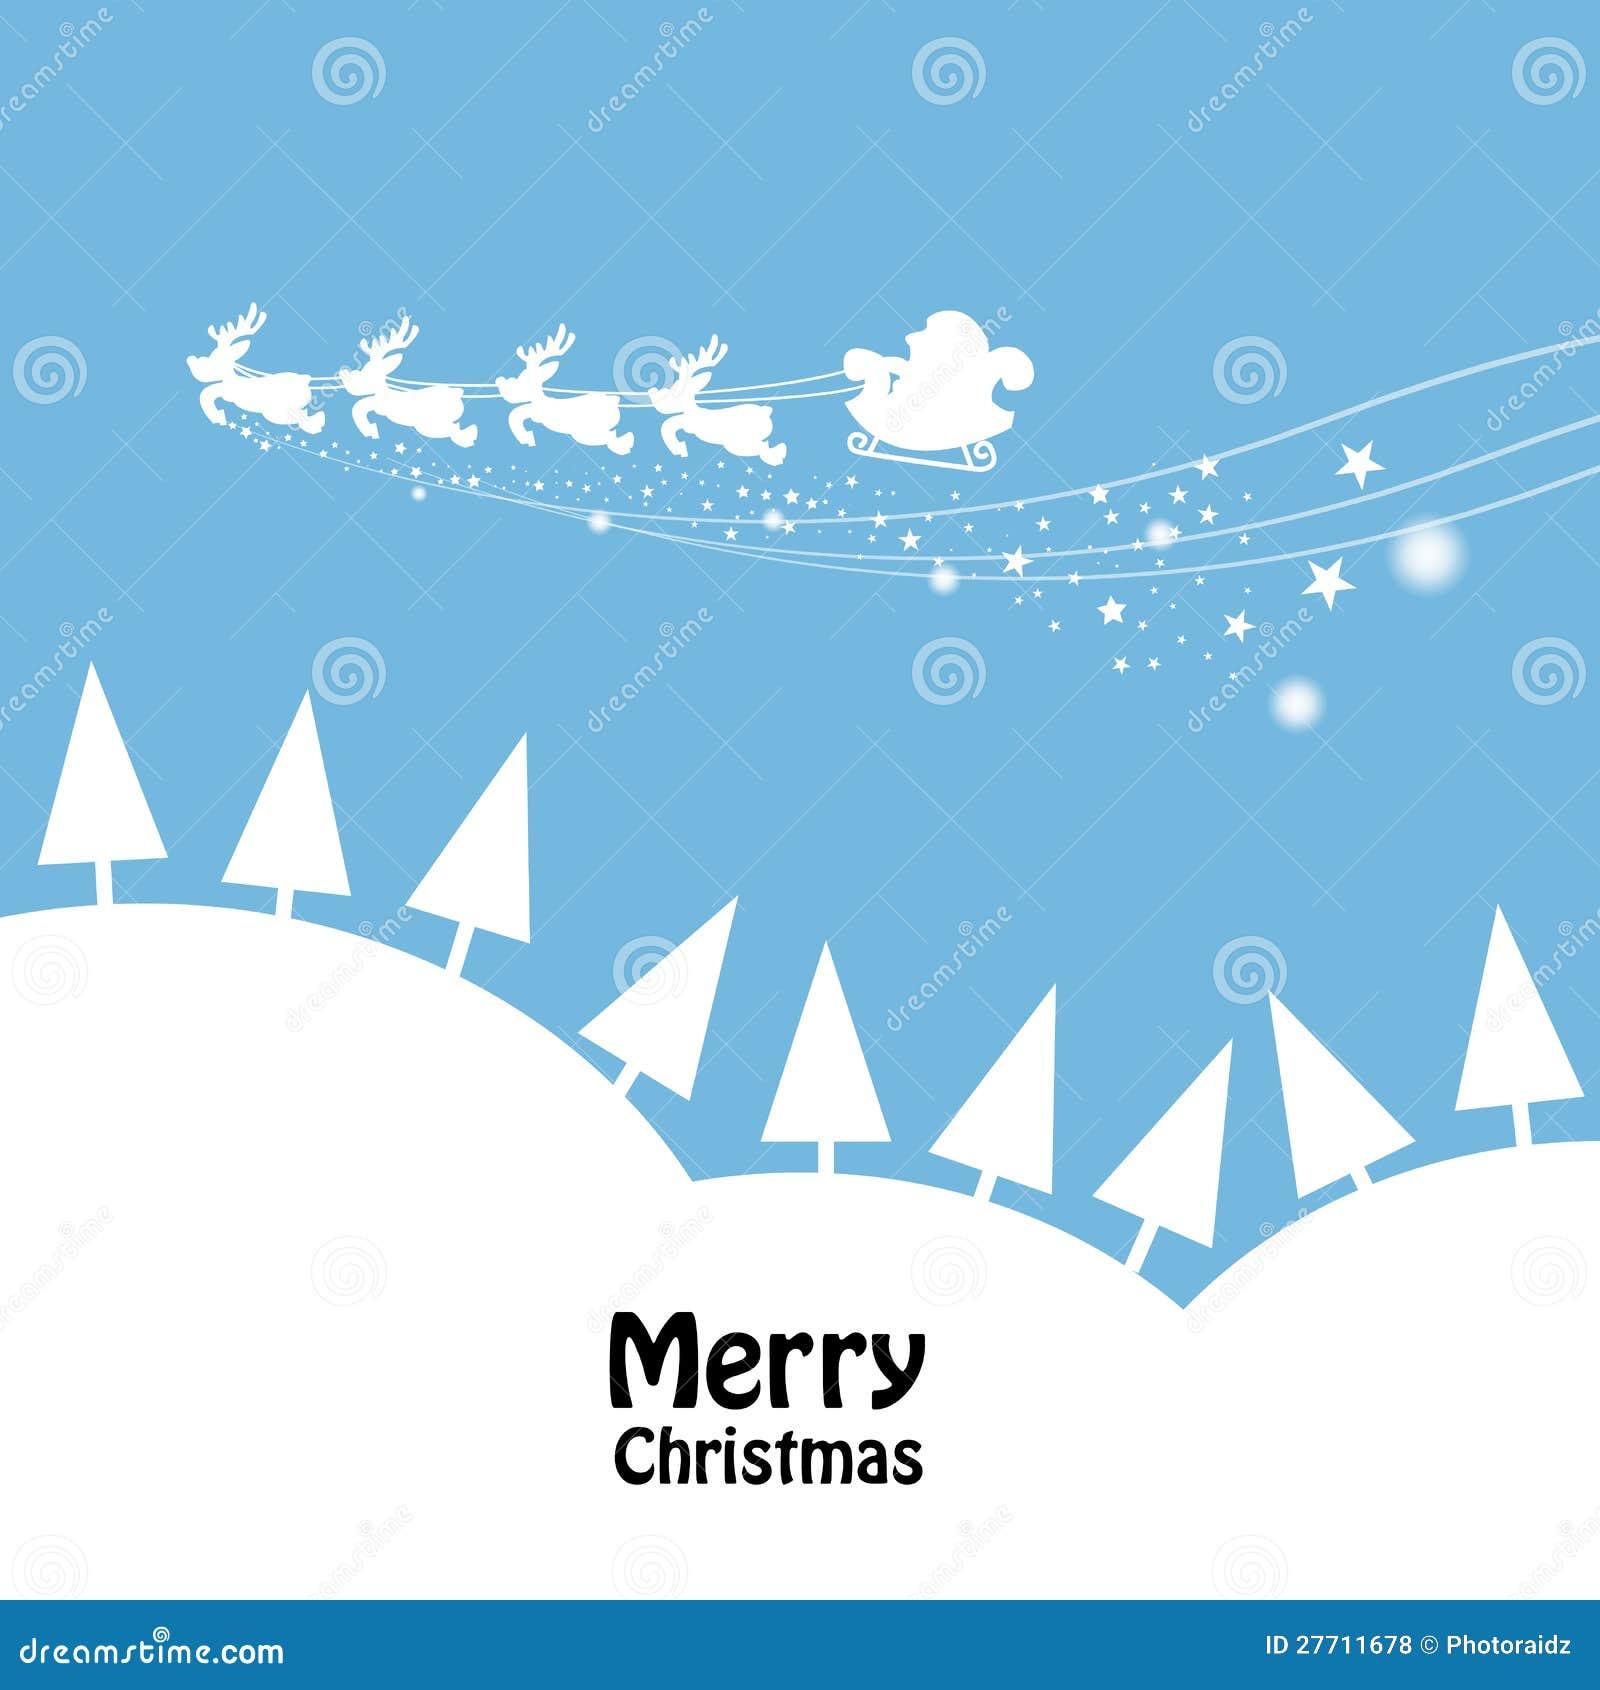 Christmas Graphic Design.Merry Christmas Graphic Design Stock Illustration